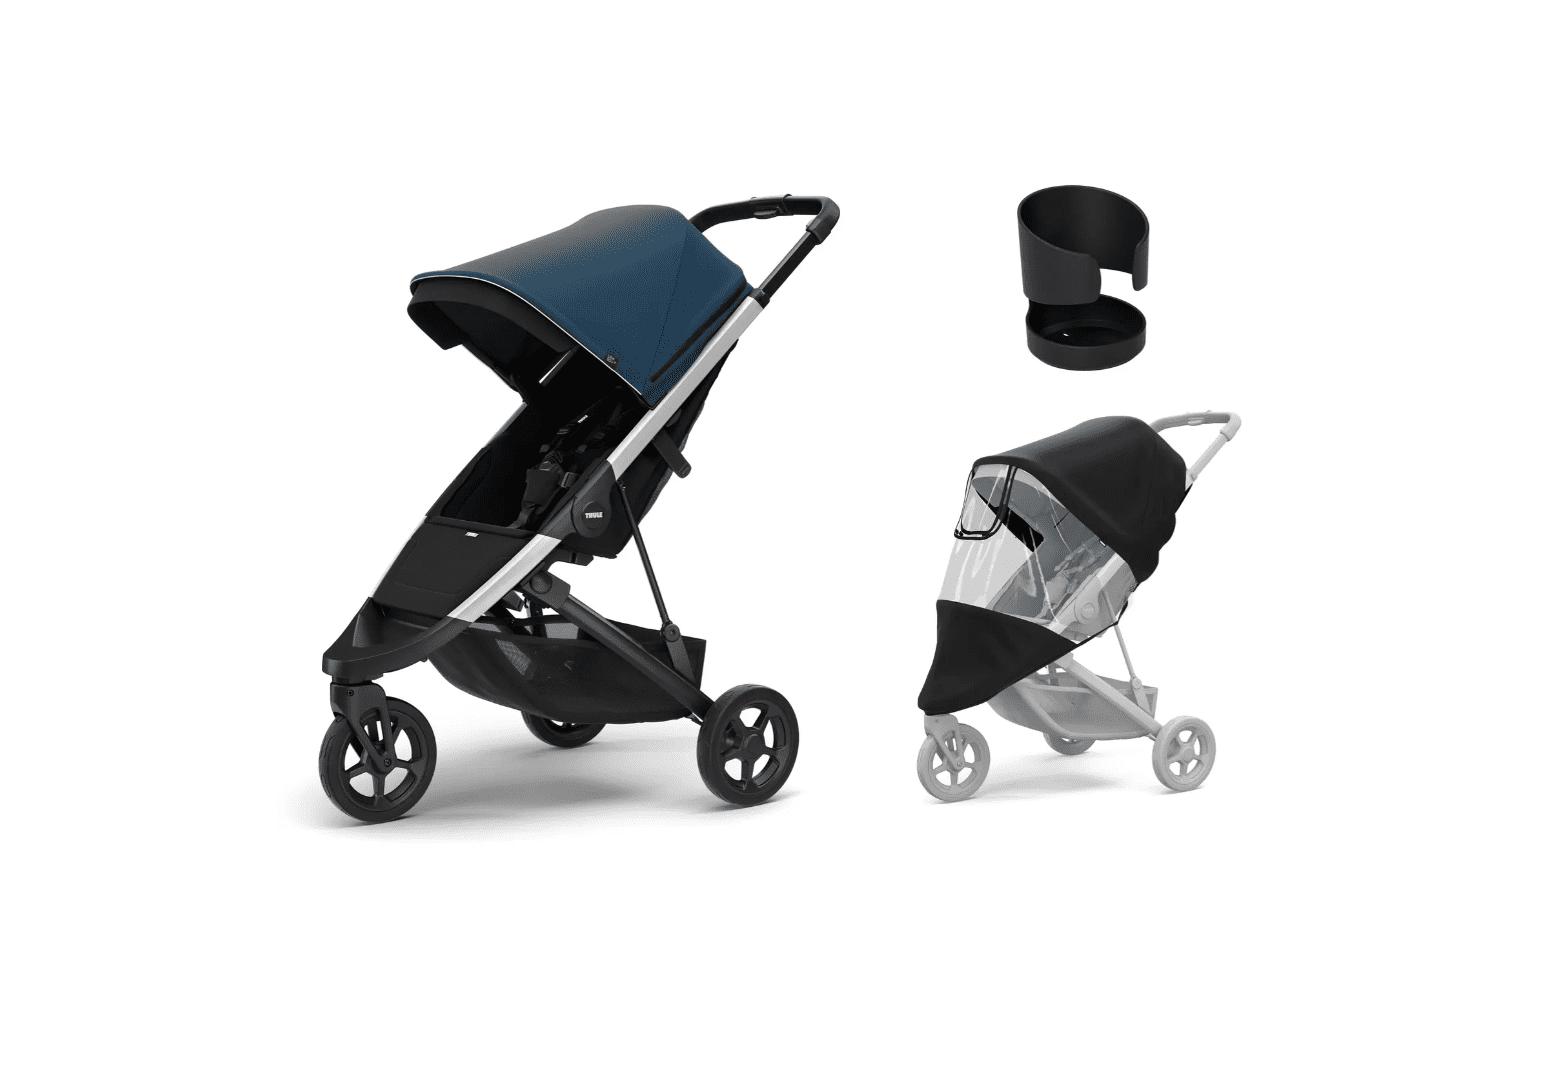 Thule Spring Stroller & Essentials Accessory Bundle